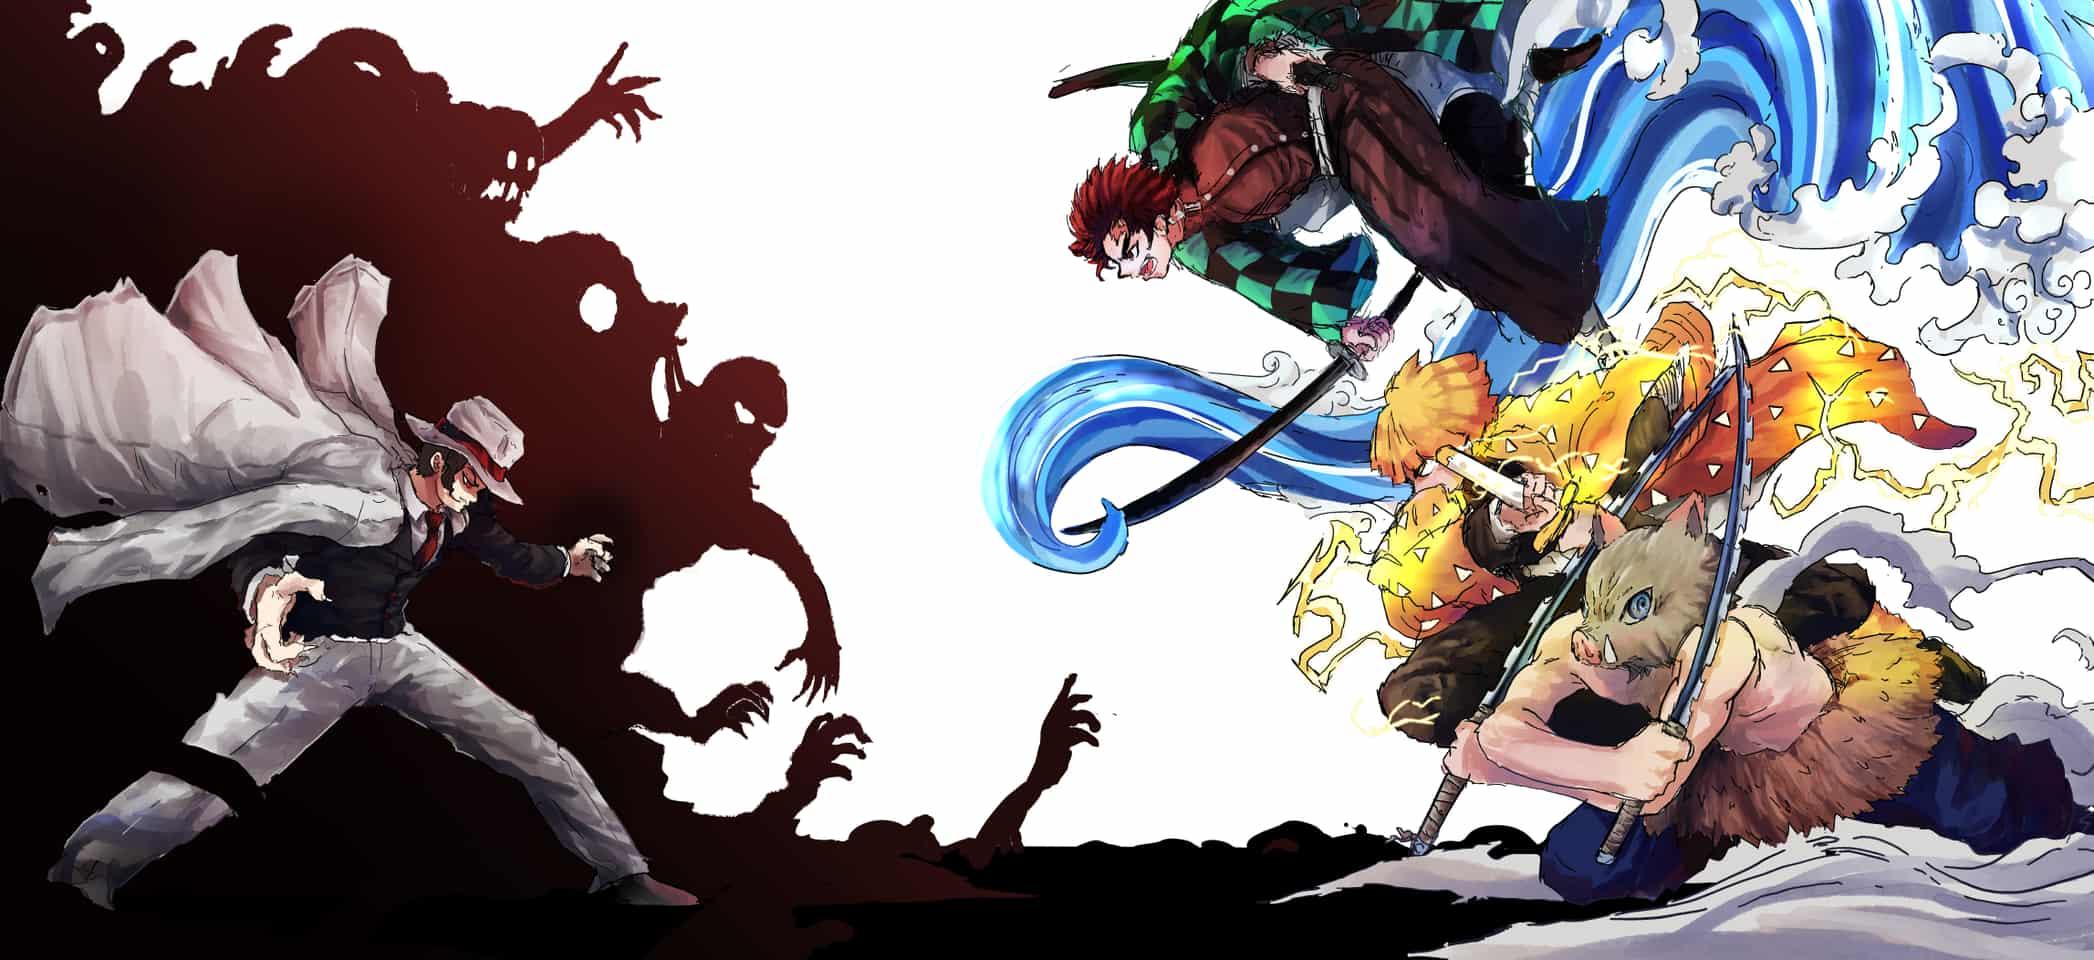 Decisive Battle!  Illust of Momogi battle DemonSlayerFanartContest AgatsumaZenitsu KibutsujiMuzan KamadoTanjirou KimetsunoYaiba HashibiraInosuke